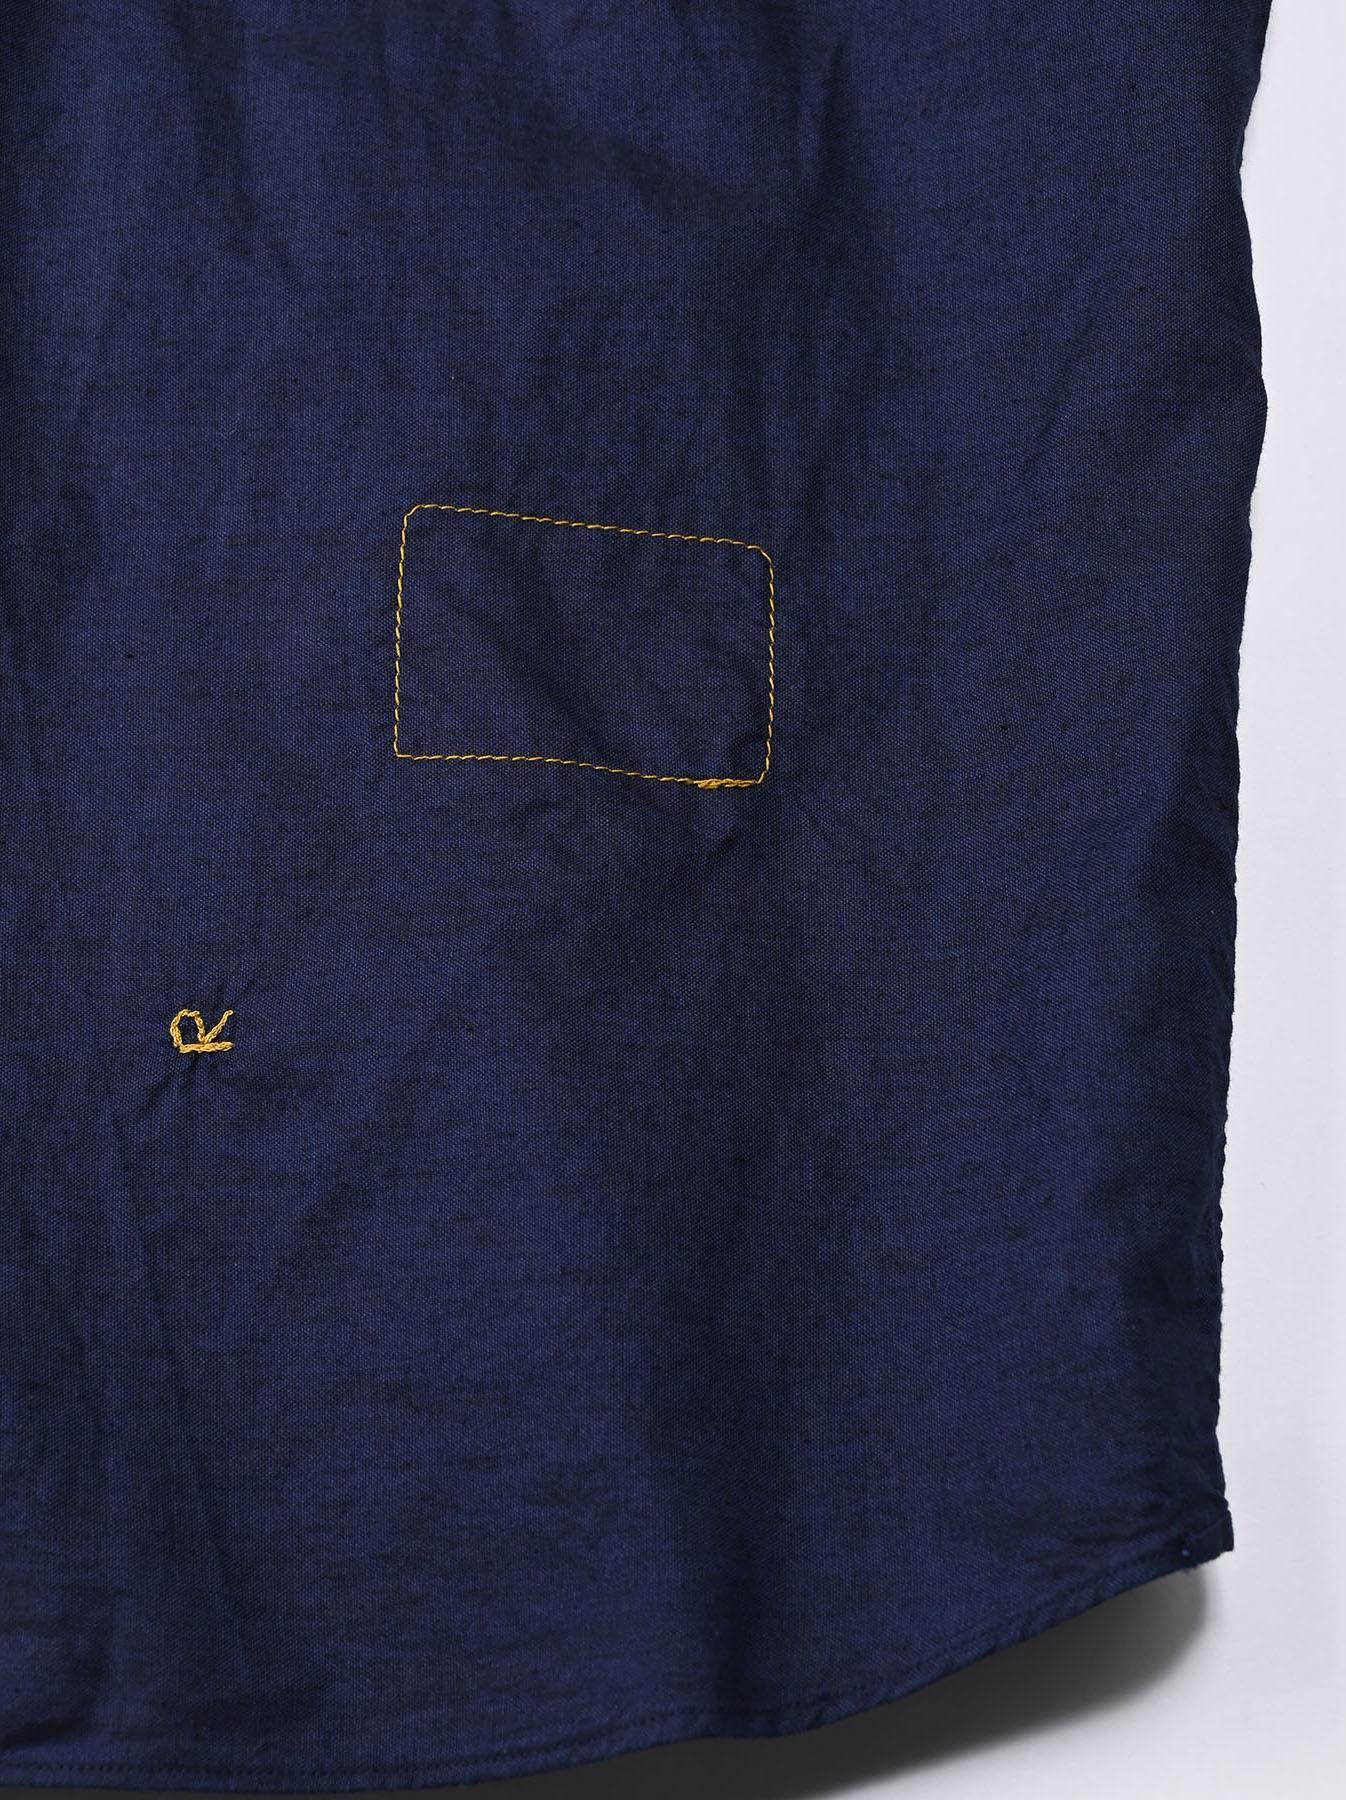 Indigo Thin Oxford 908 Ocean Lace Shirt (0621)-10